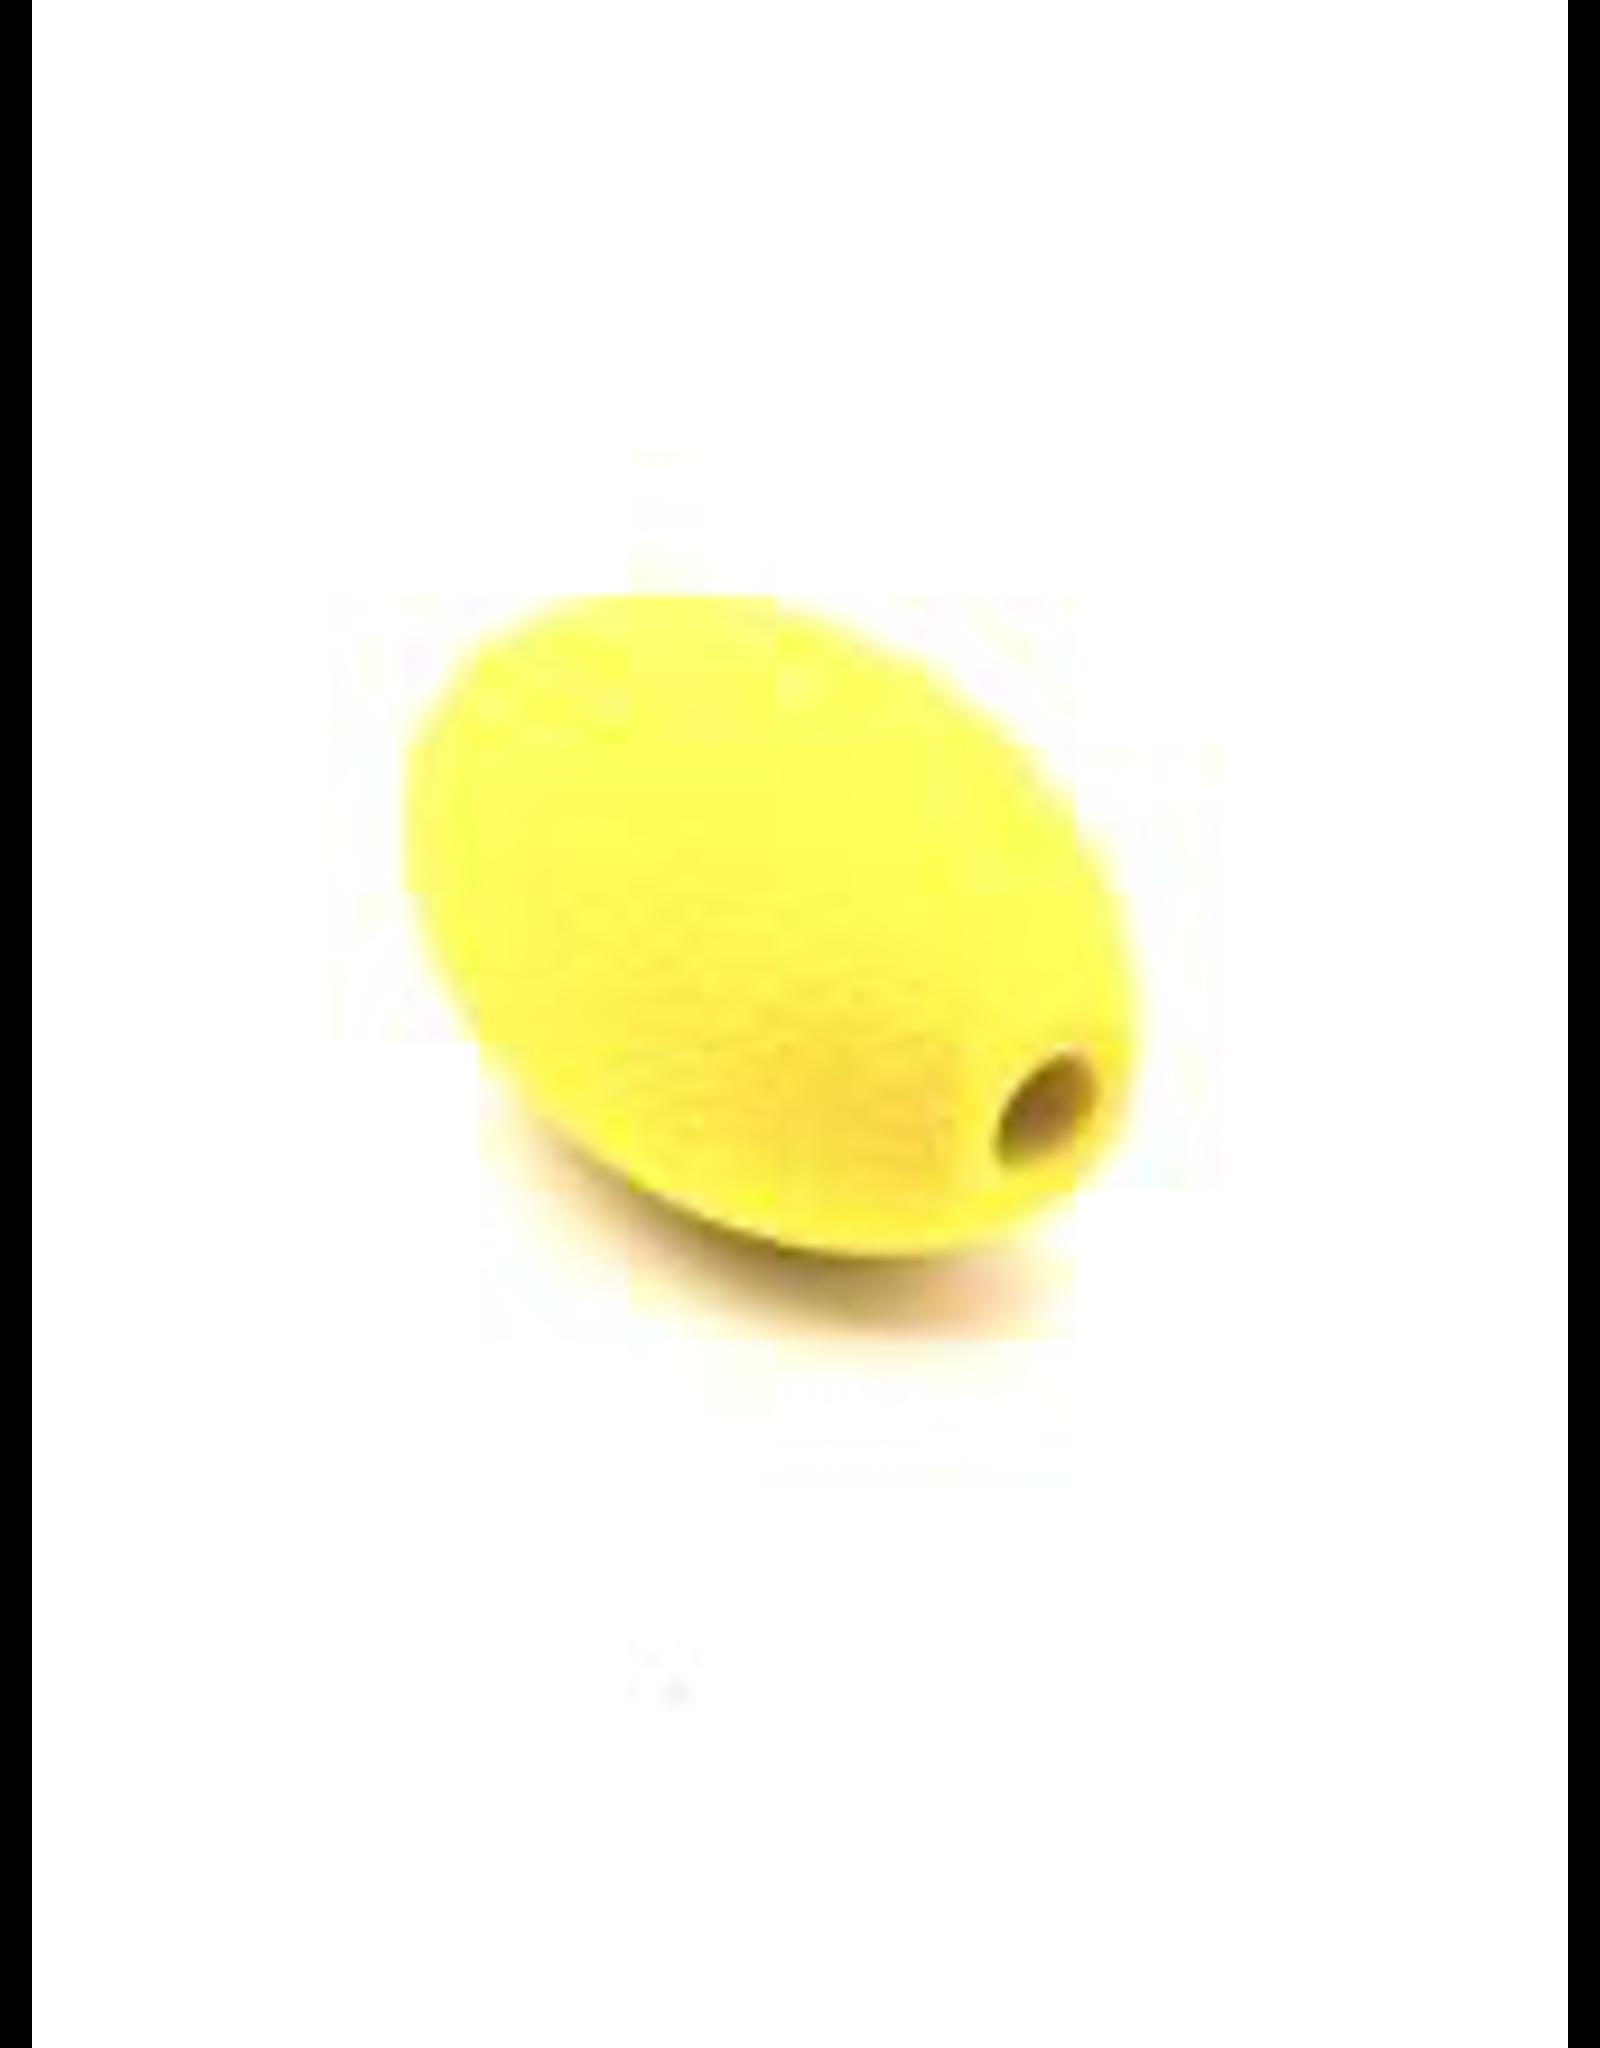 Diamond Core Tools Egg shape XL FoamGrip